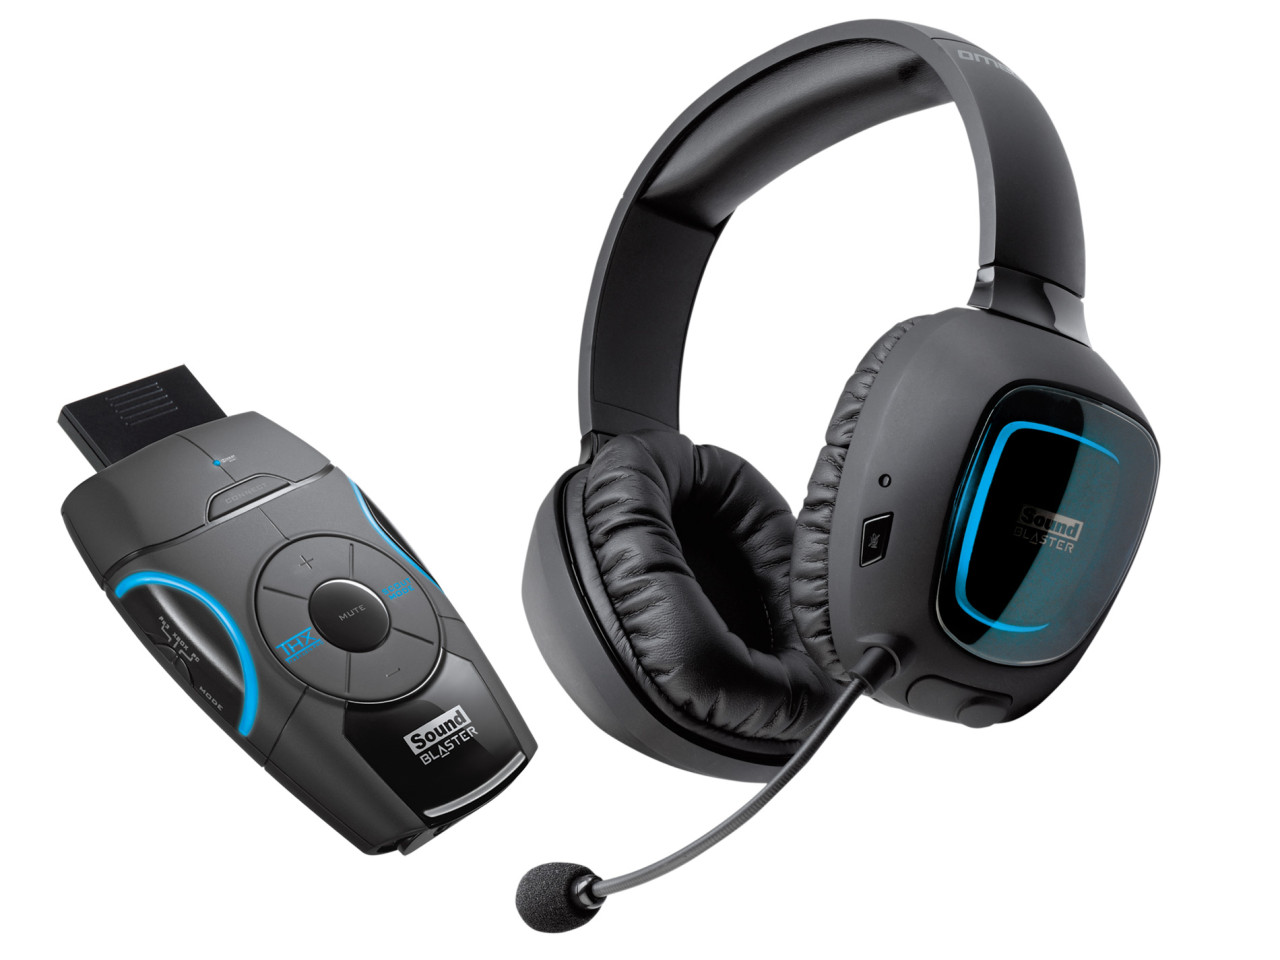 https://www.madboxpc.com/wp-content/uploads/2011/09/Recon3D_Omega_Wireless.jpg